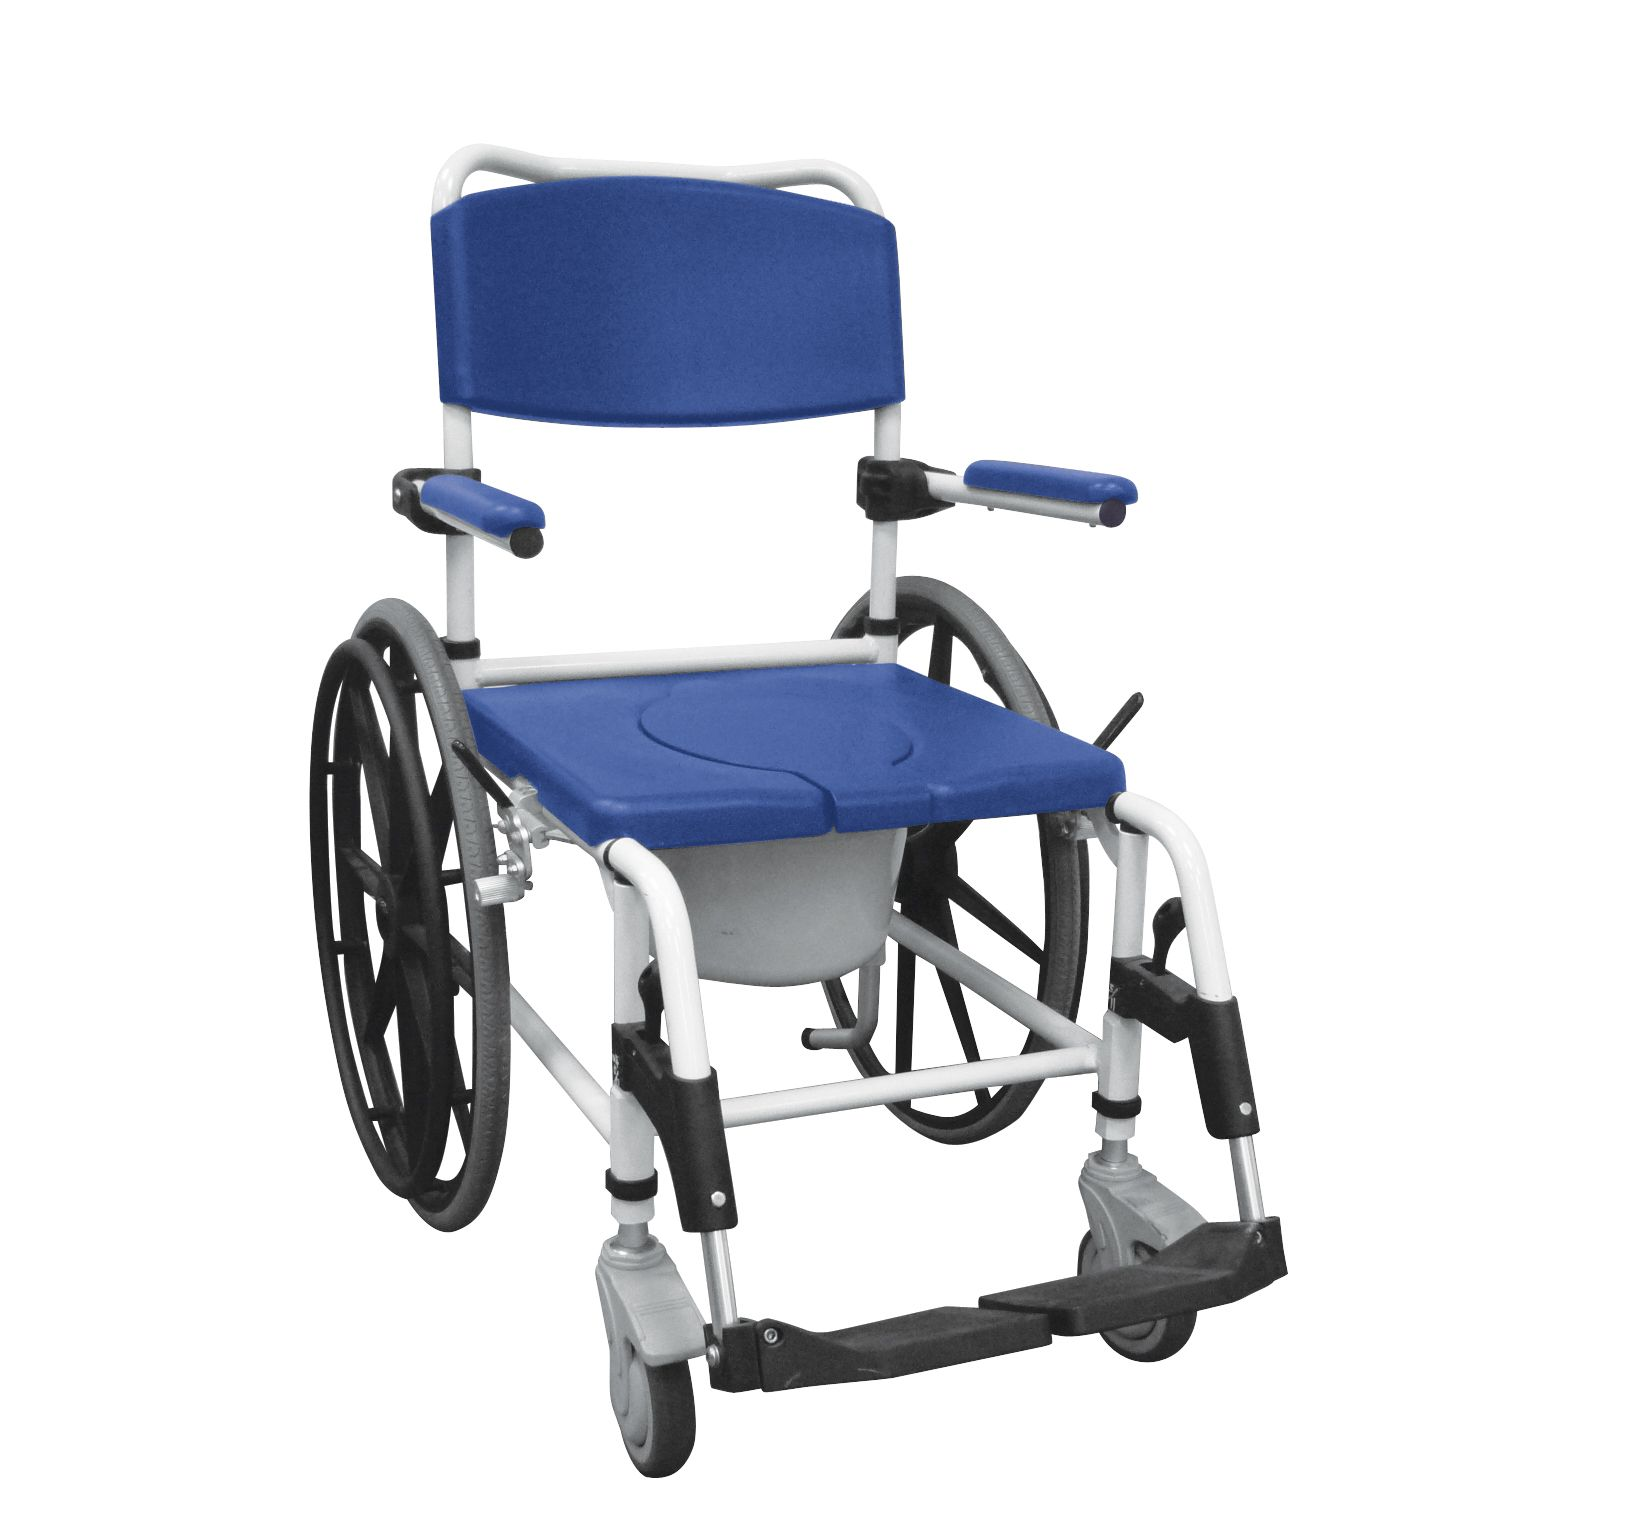 Duschstuhl Auf Rädern Shower commode chair, Commode